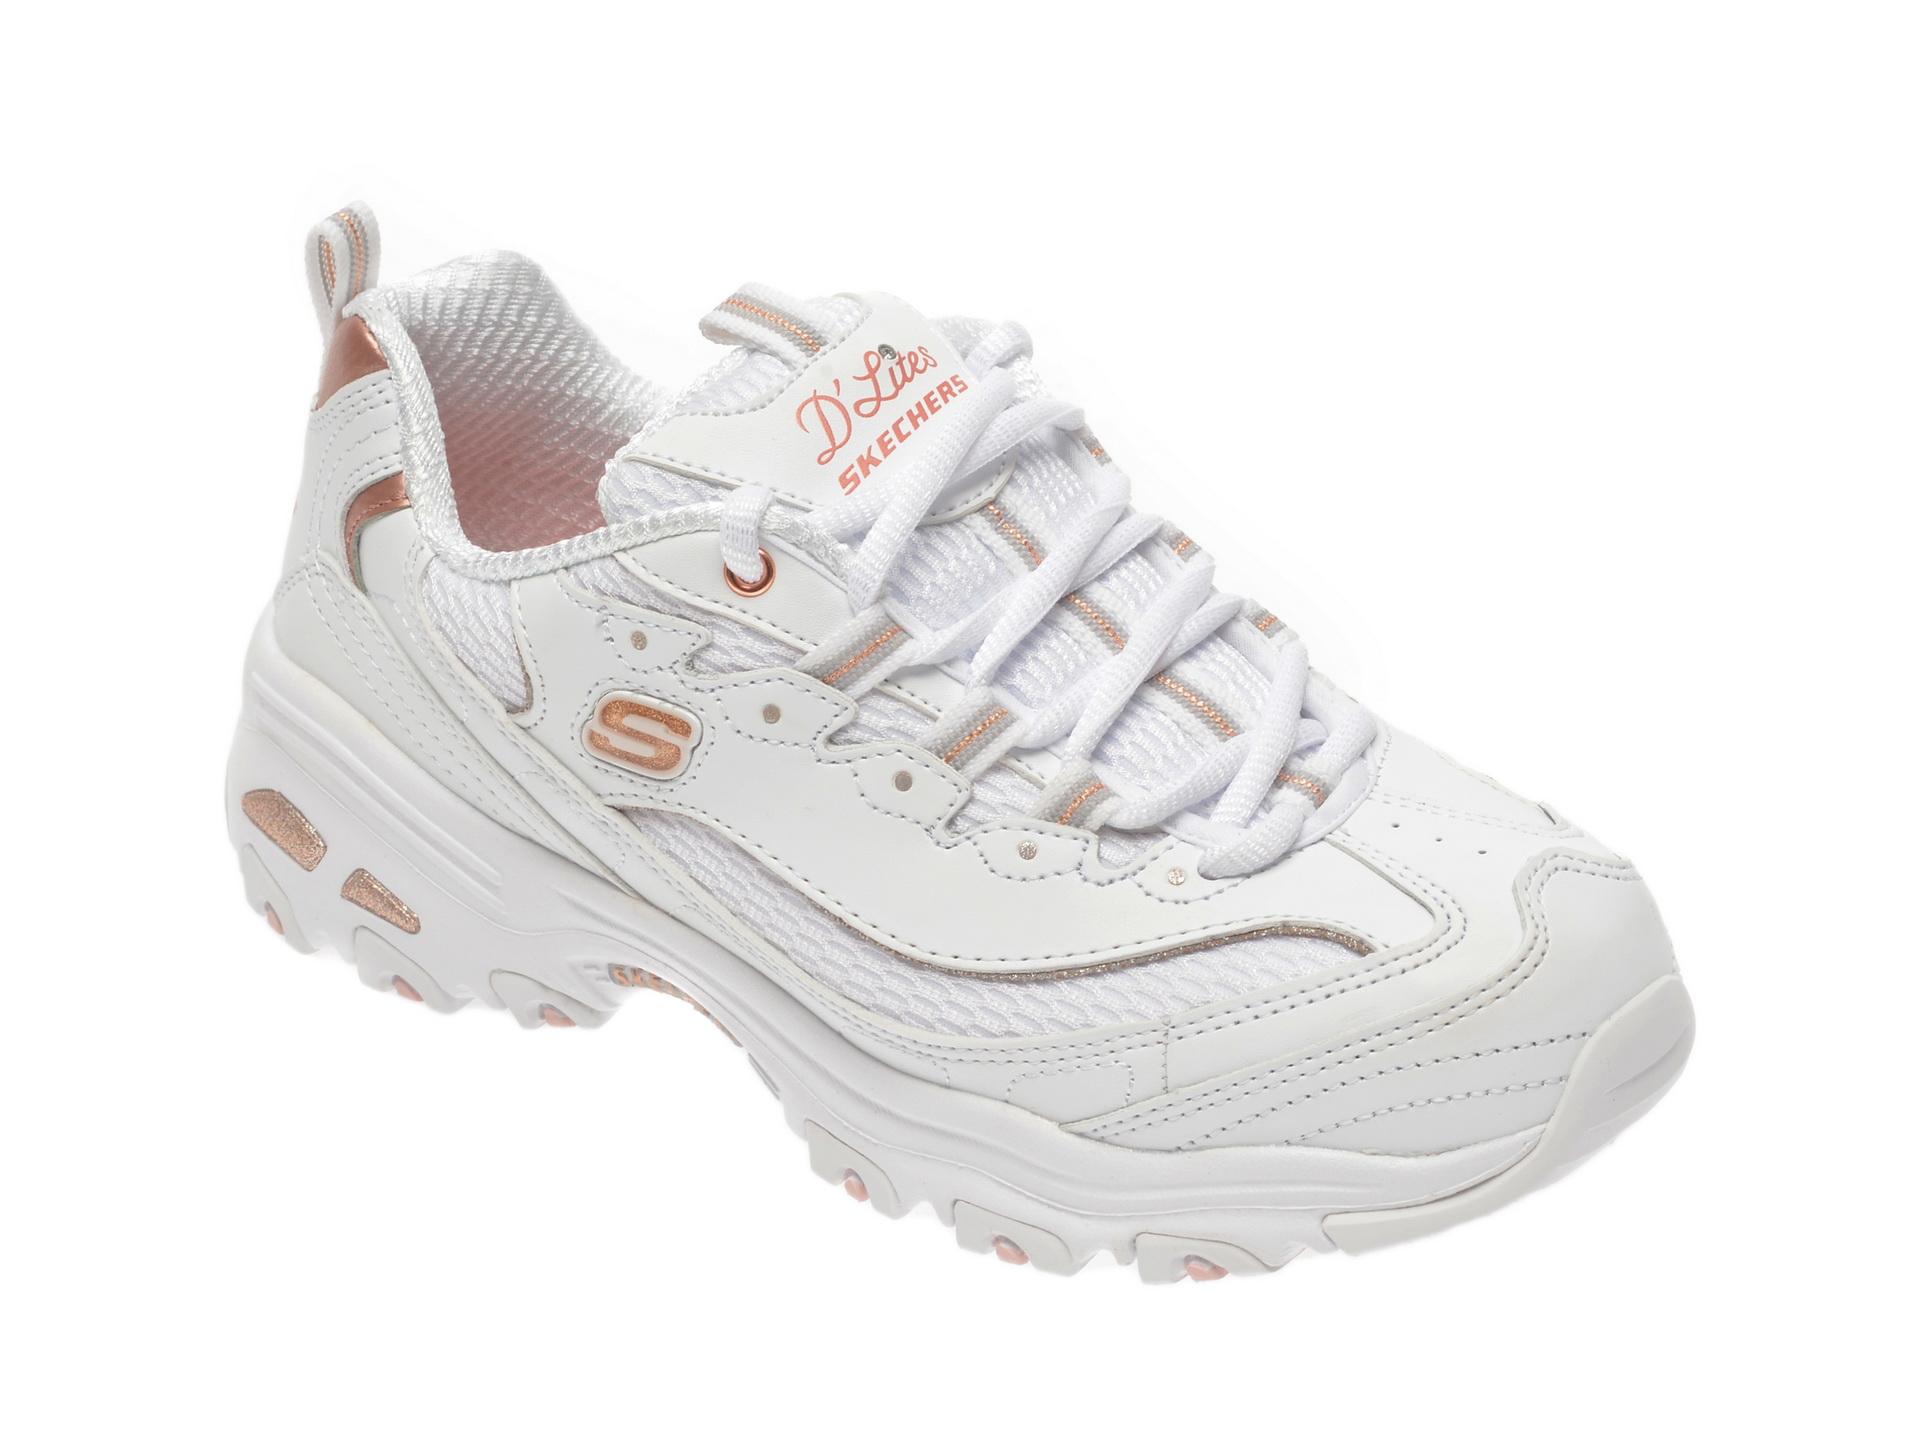 Pantofi sport SKECHERS albi, Dlites Copper Divine, din material textil piele naturala